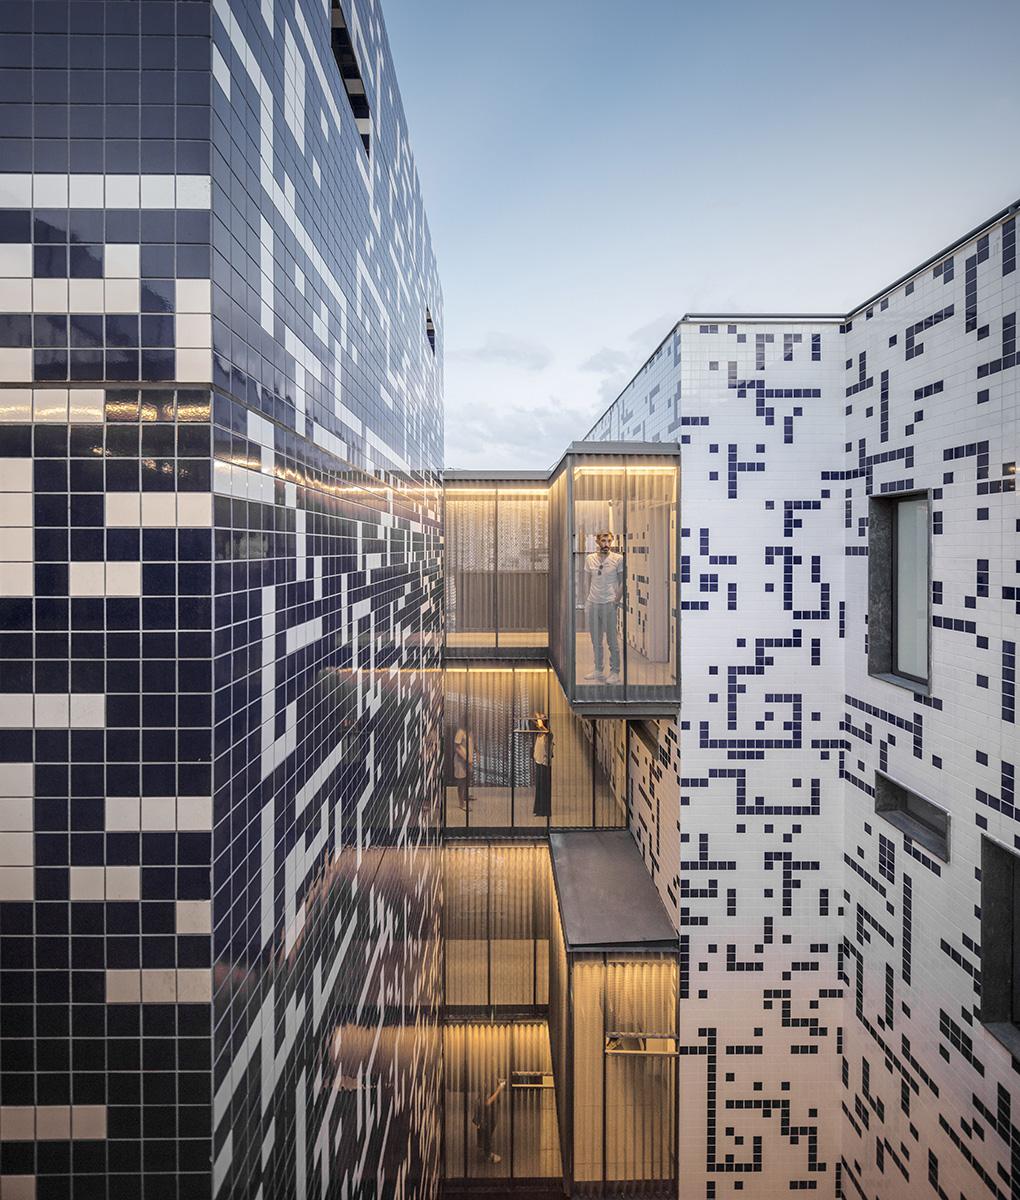 11-arapiraca-triptyque-architecture-foto-fernando-guerra